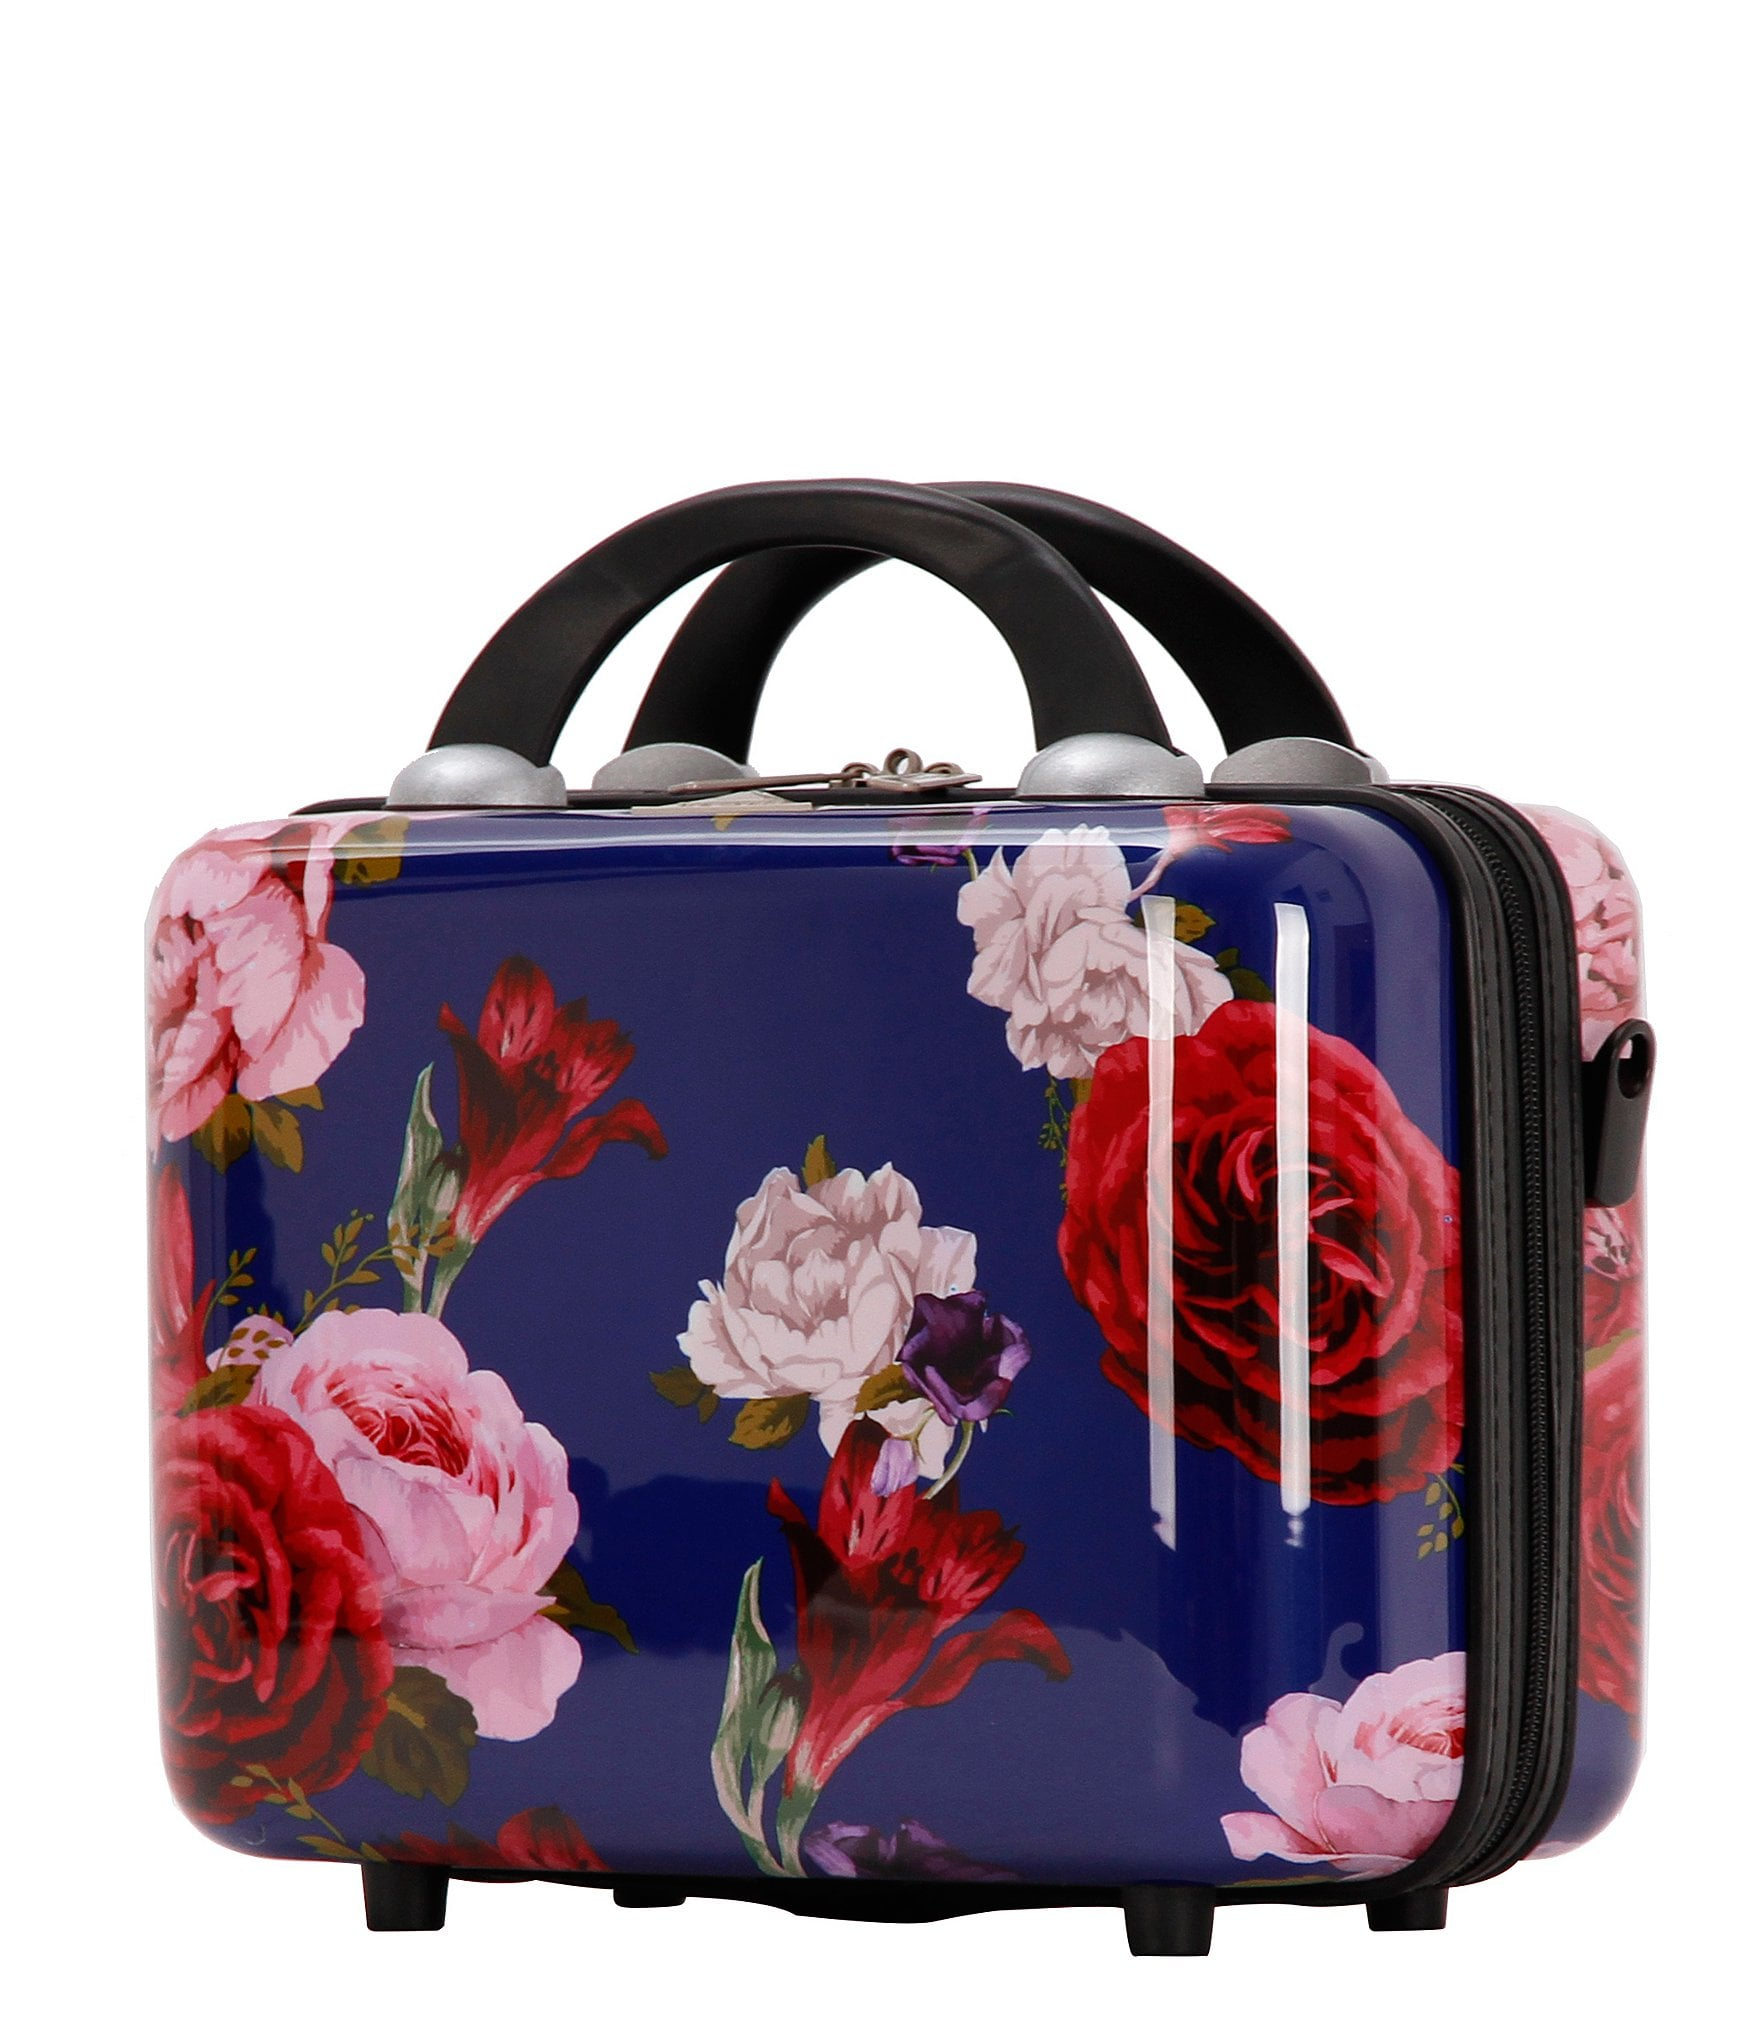 Triforce Versailles Collection Floral Travel Beauty Case